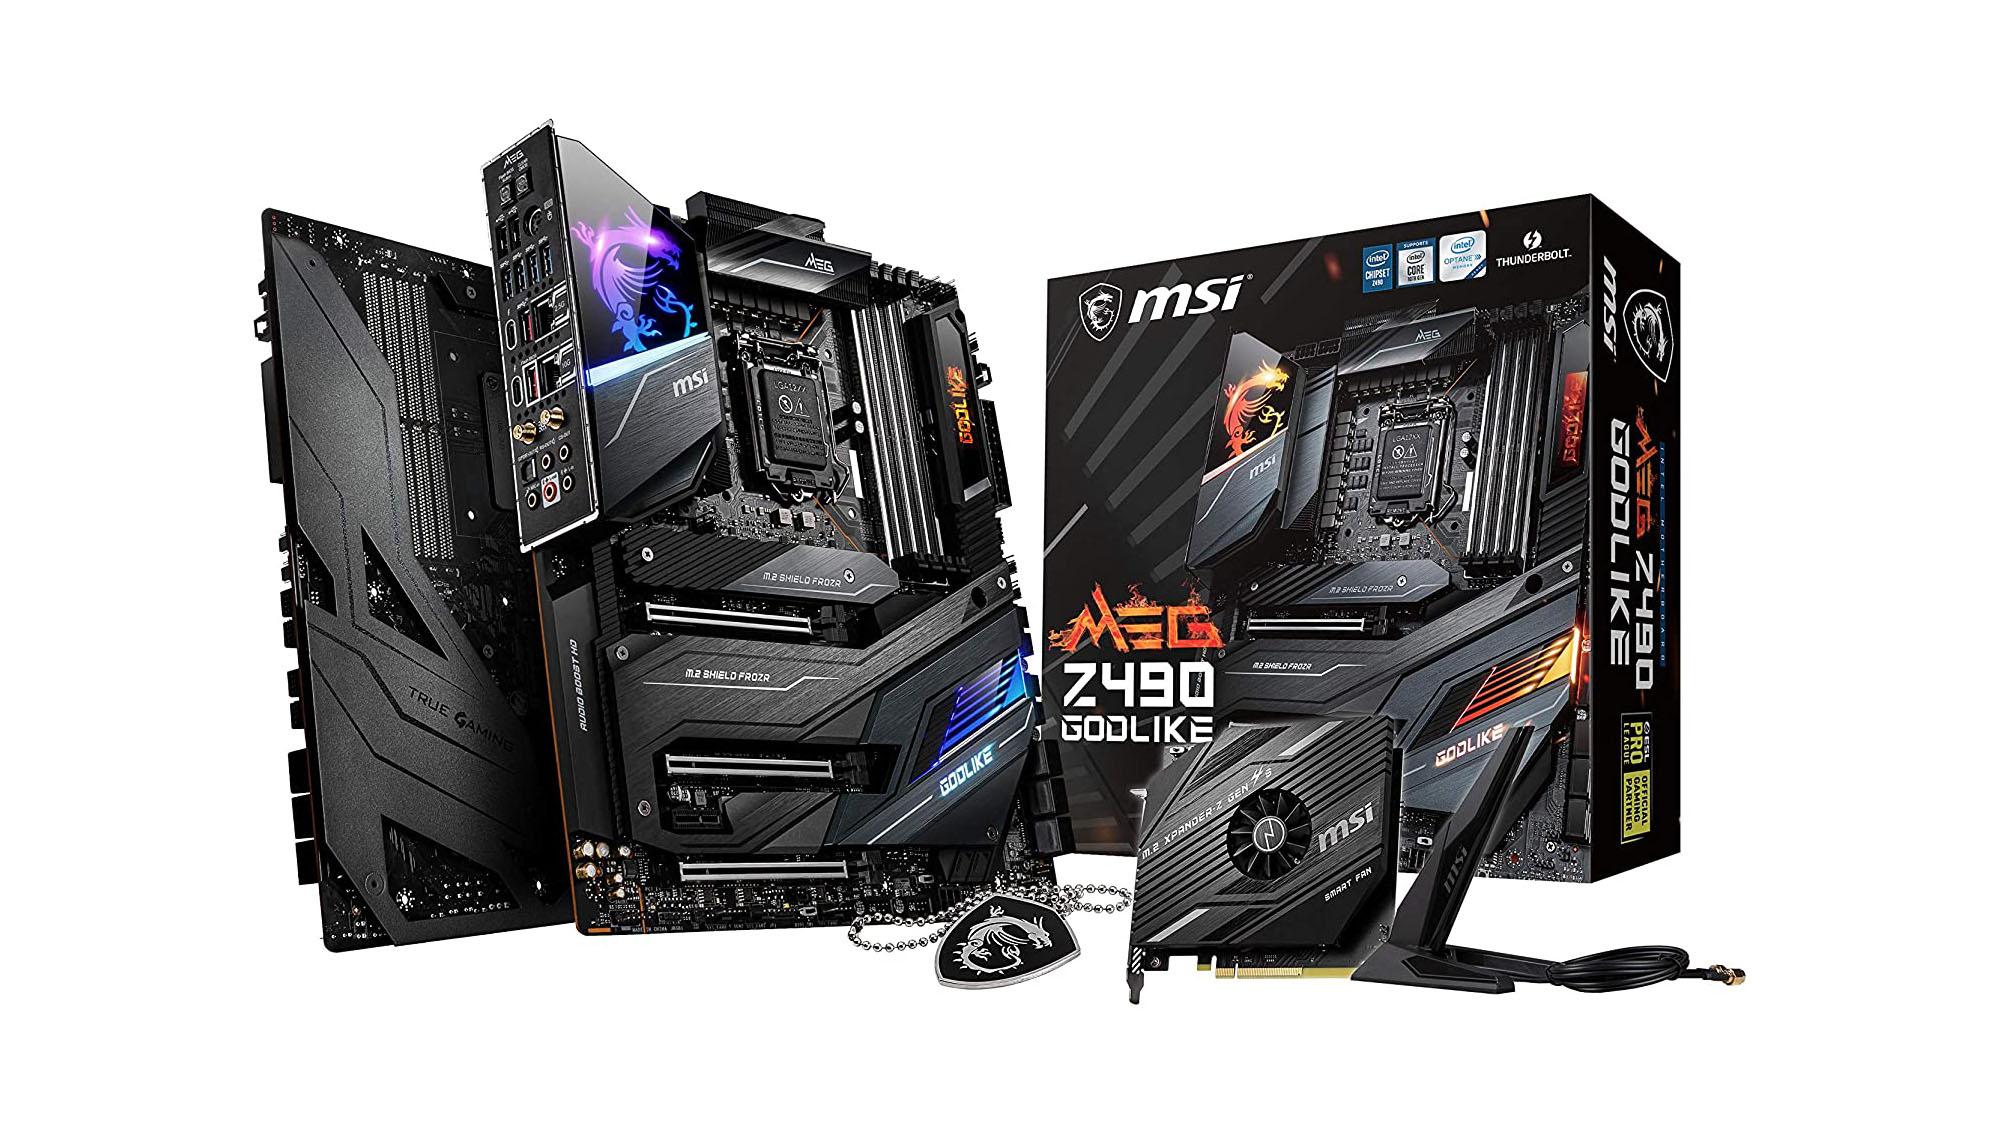 Best motherboards: MSI MEG Z490 Godlike